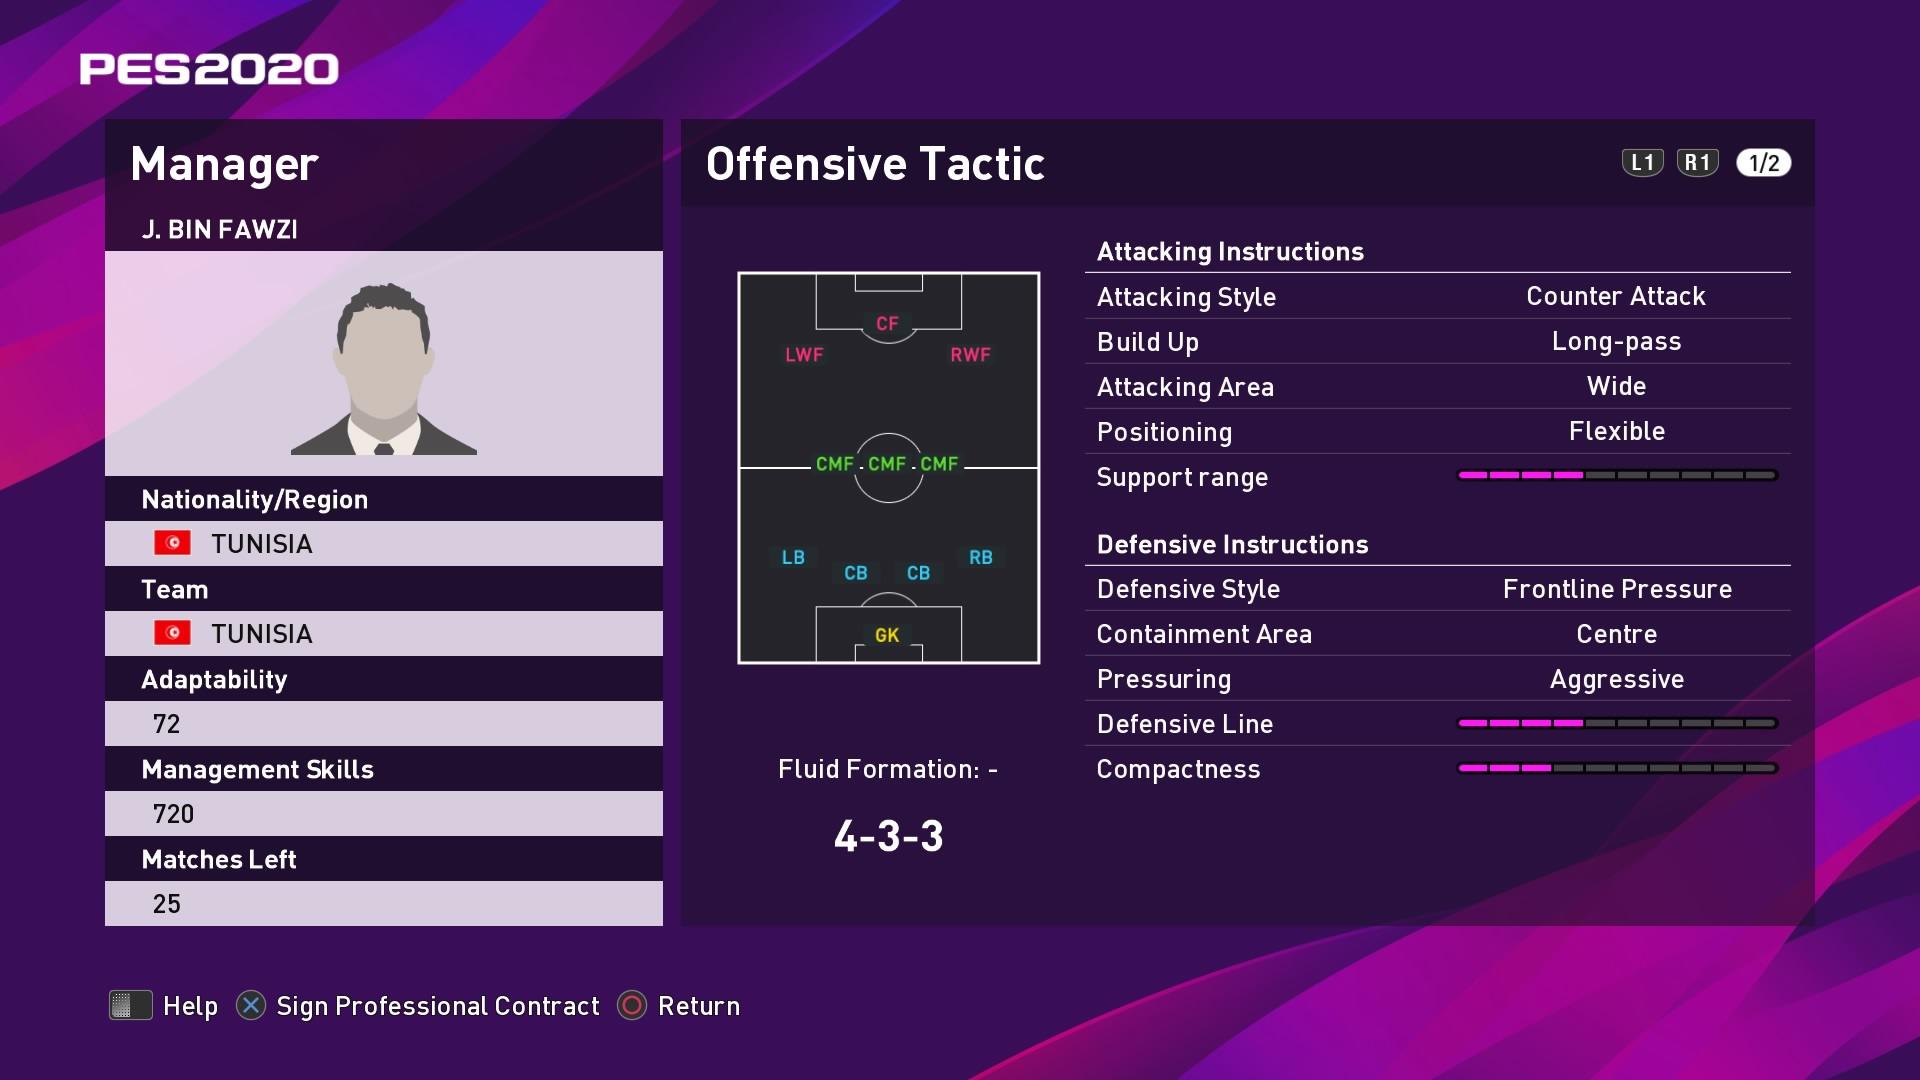 J. Bin Fawzi (Mondher Kebaier) Offensive Tactic in PES 2020 myClub